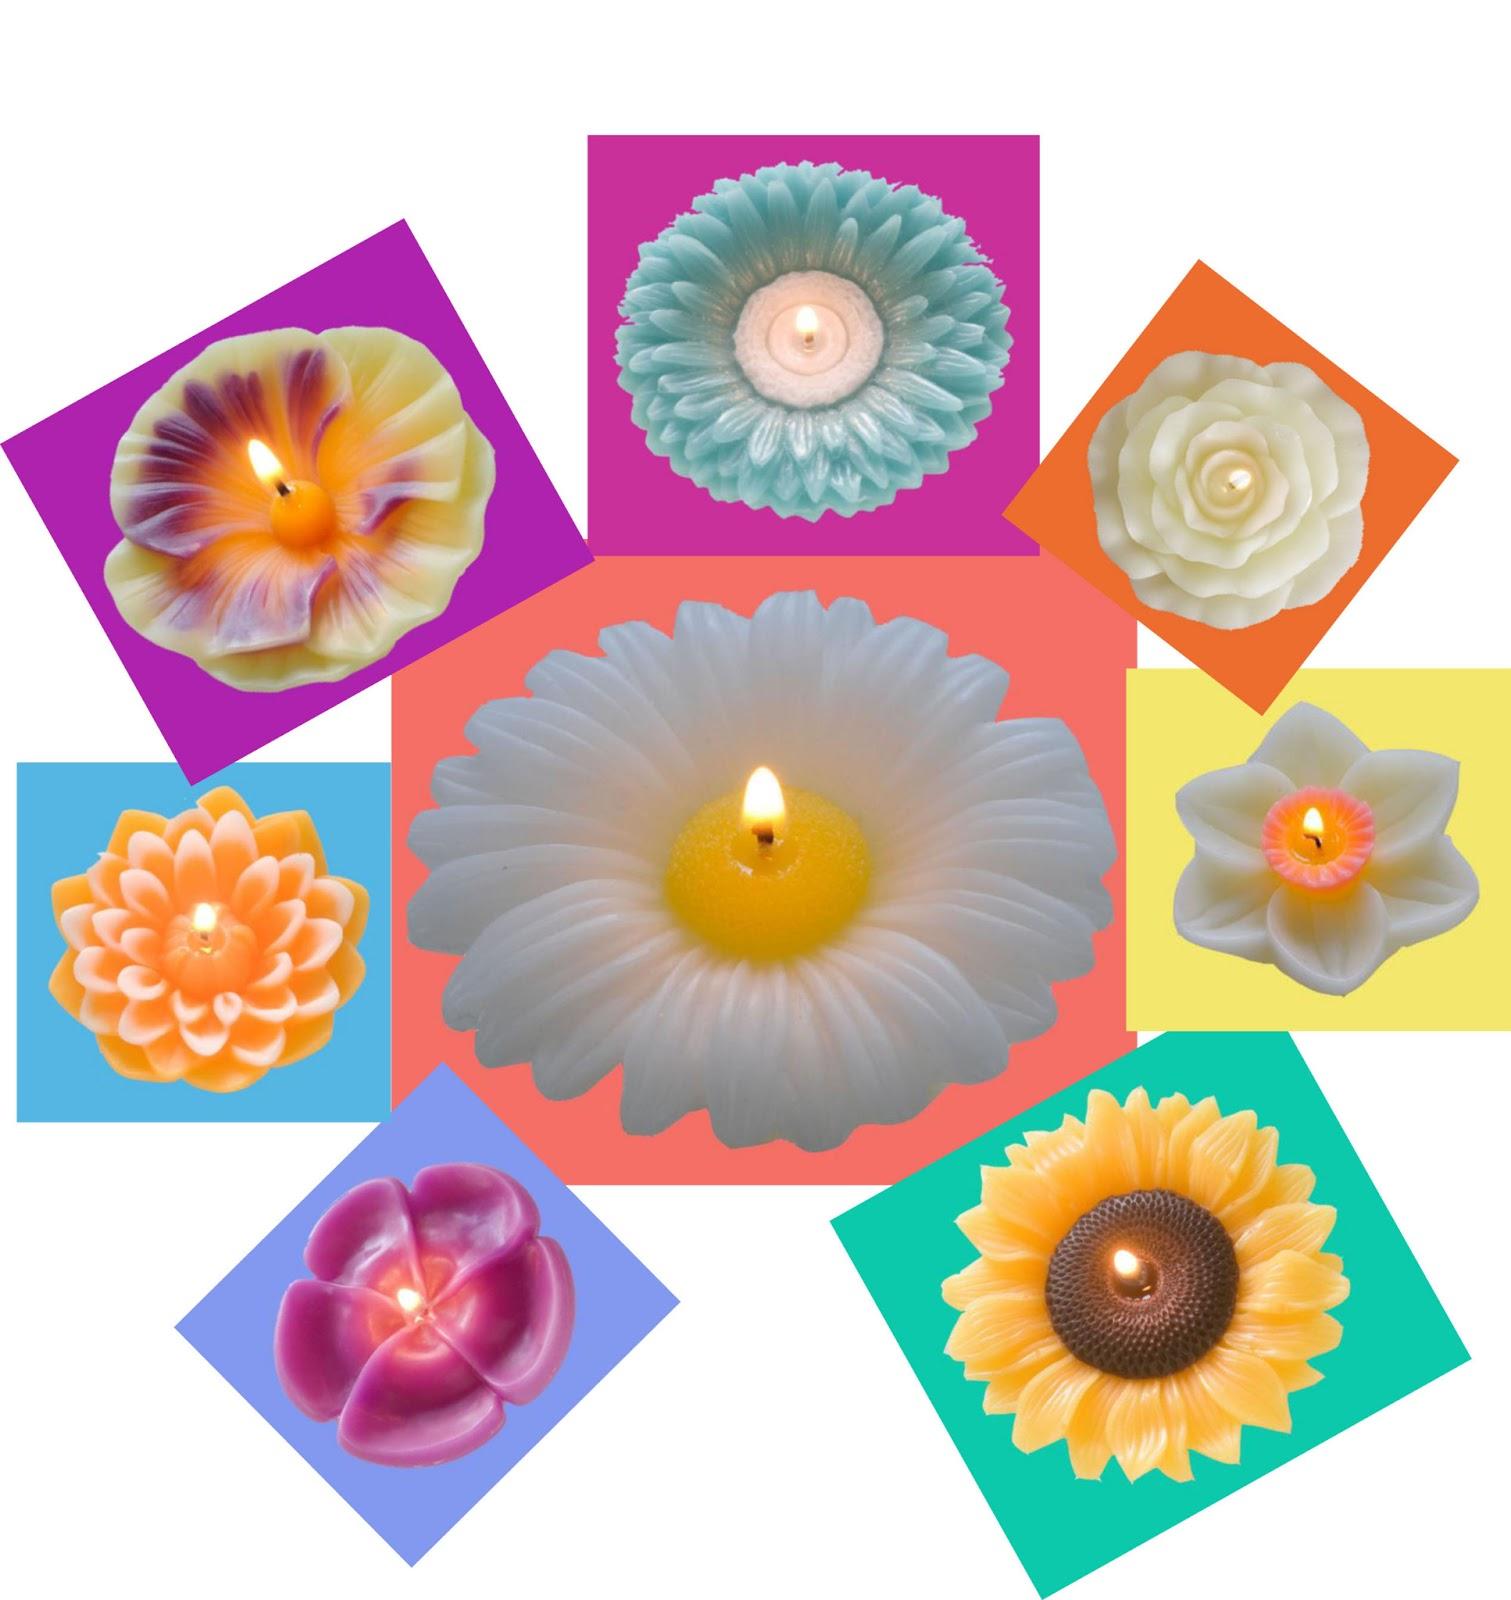 Plumeria, Daisy, Gerbera Daisy, Dahlia, Pansy, Sunflower, Rose, Daffodil